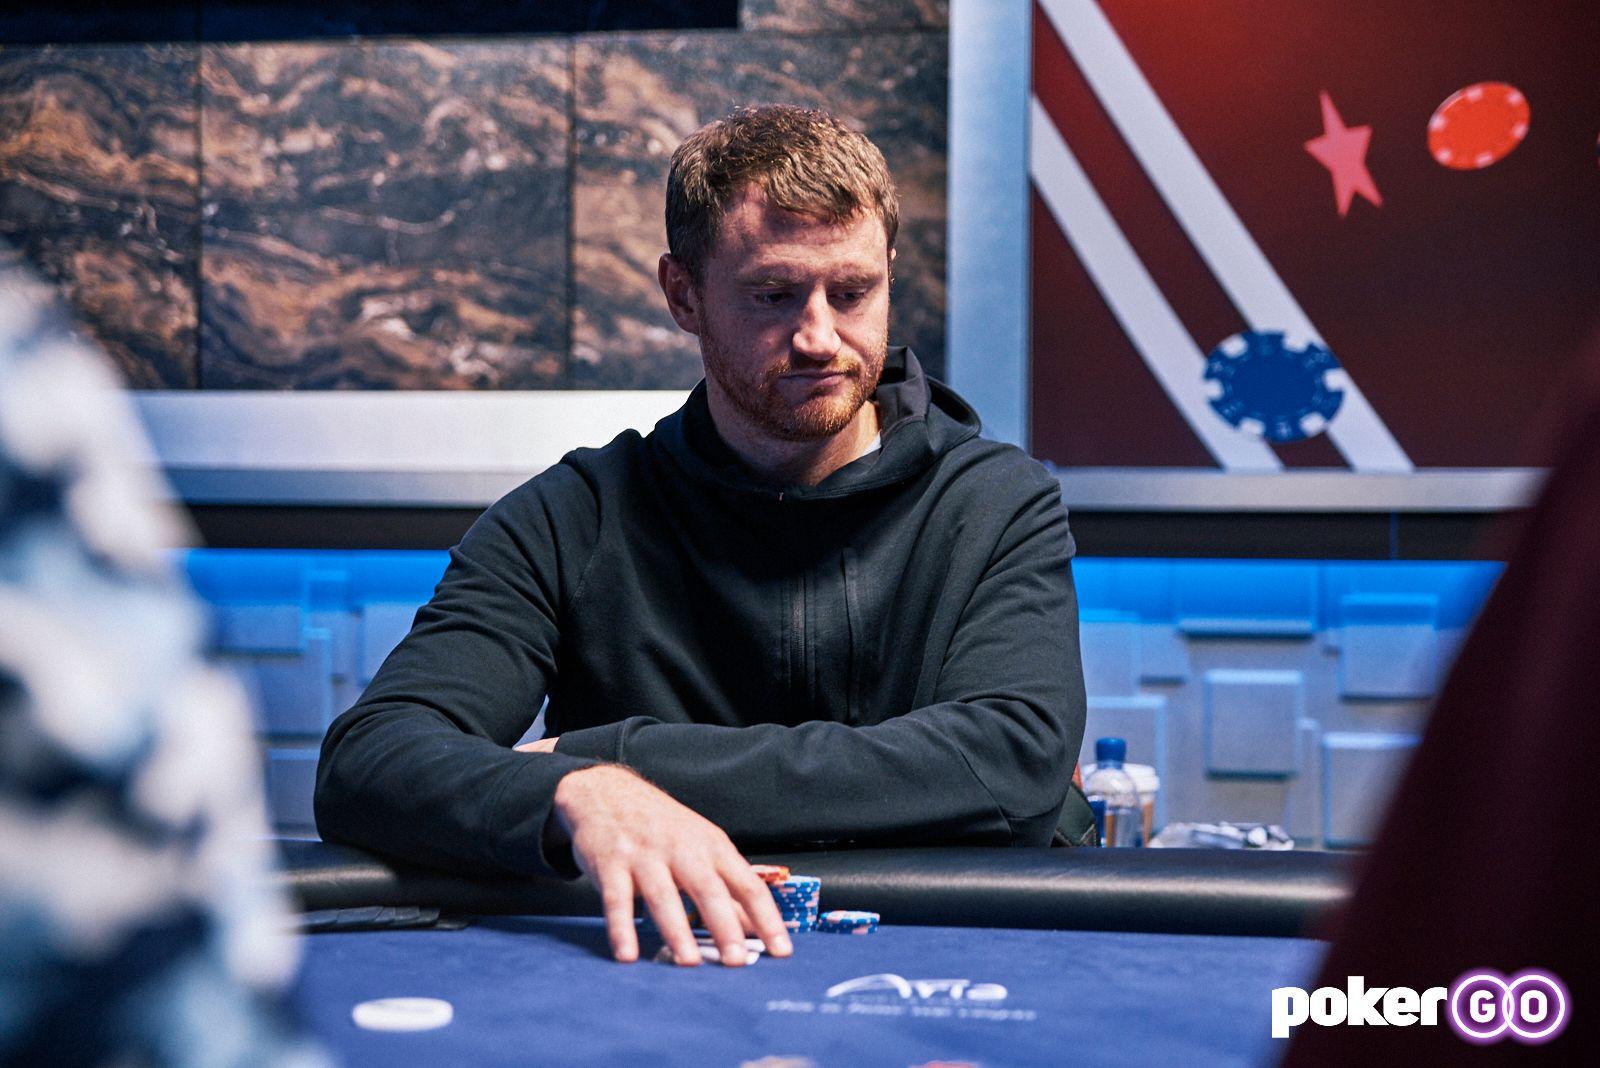 david peters poker uspo